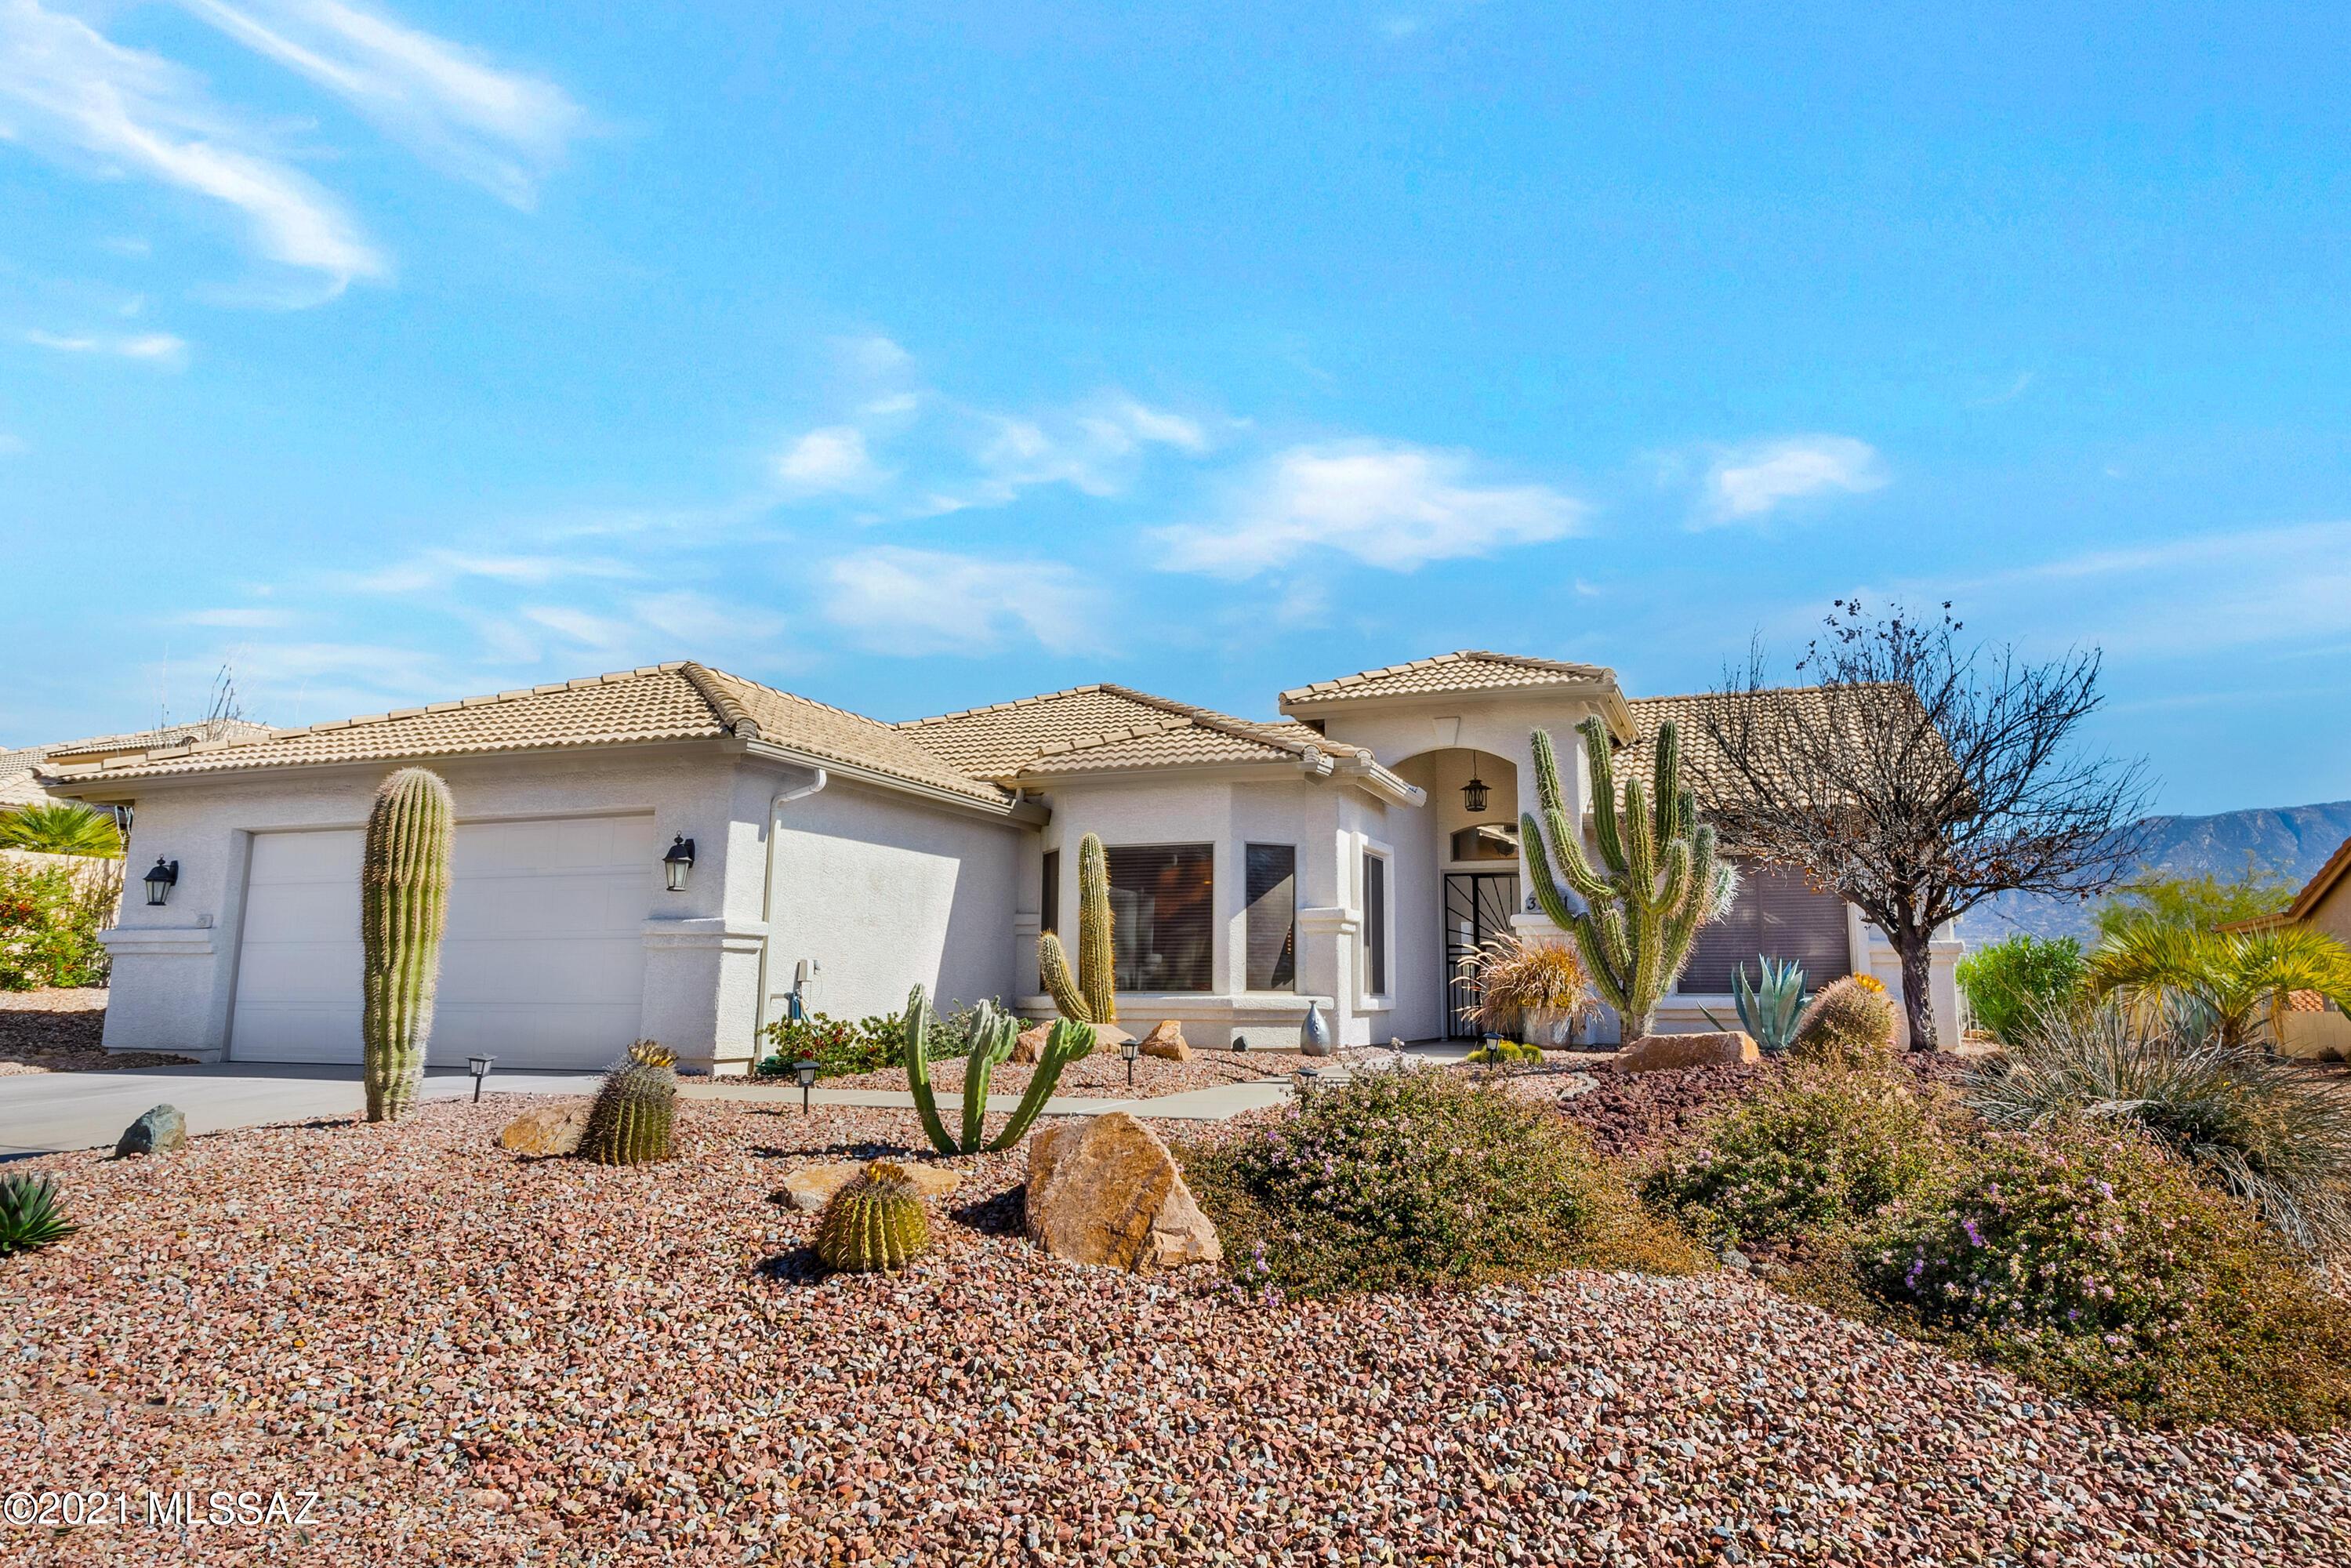 Photo of 37181 S Hill Side Drive, Saddlebrooke, AZ 85739